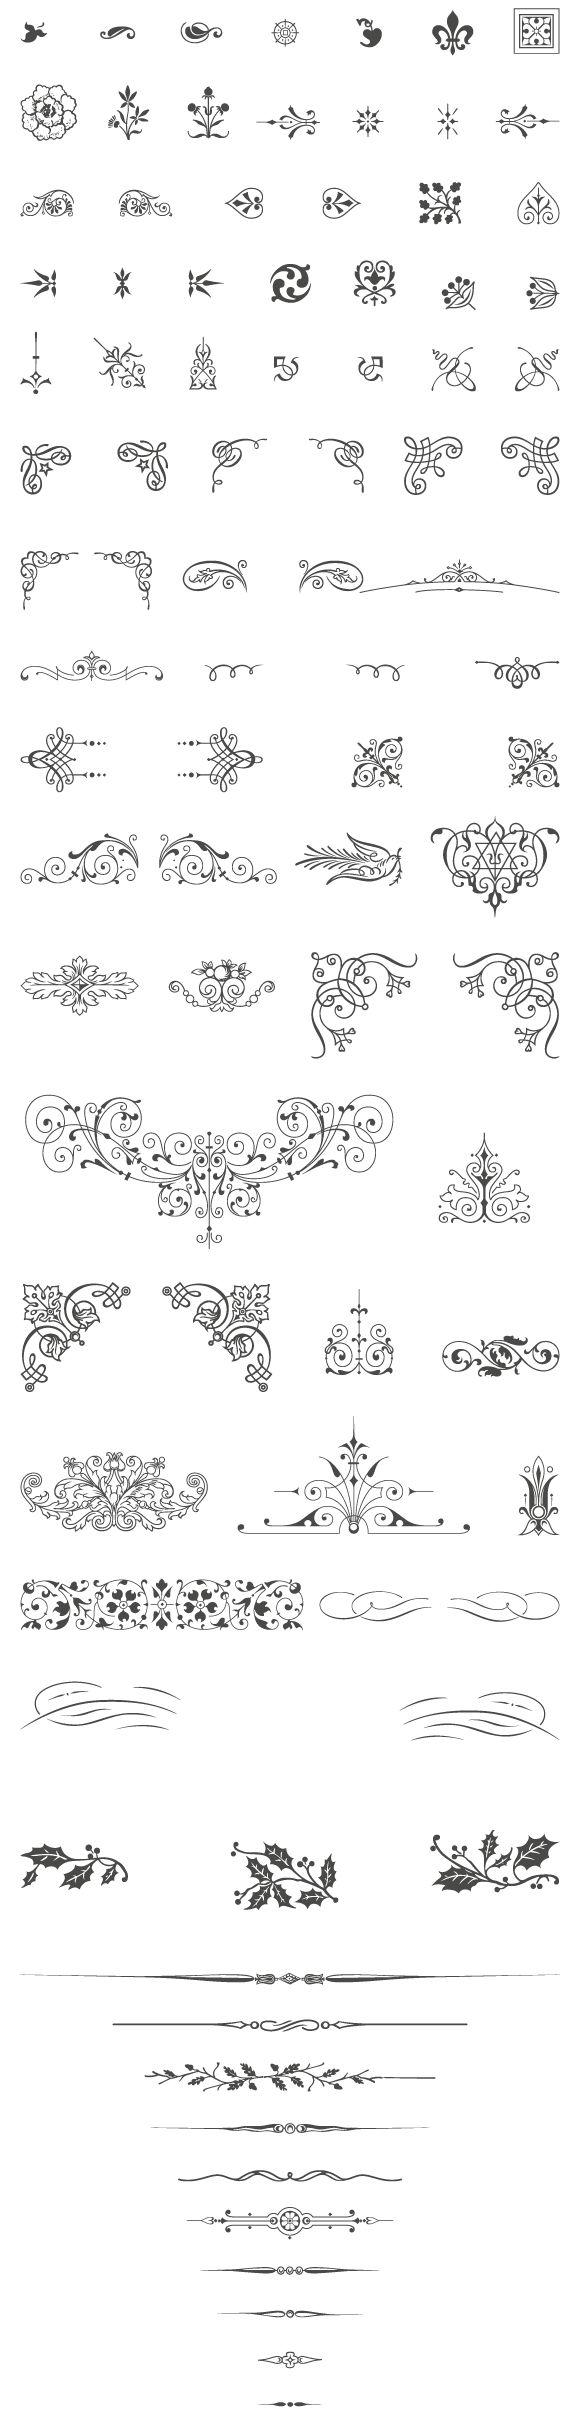 best 25 vector images free ideas on pinterest free vector art